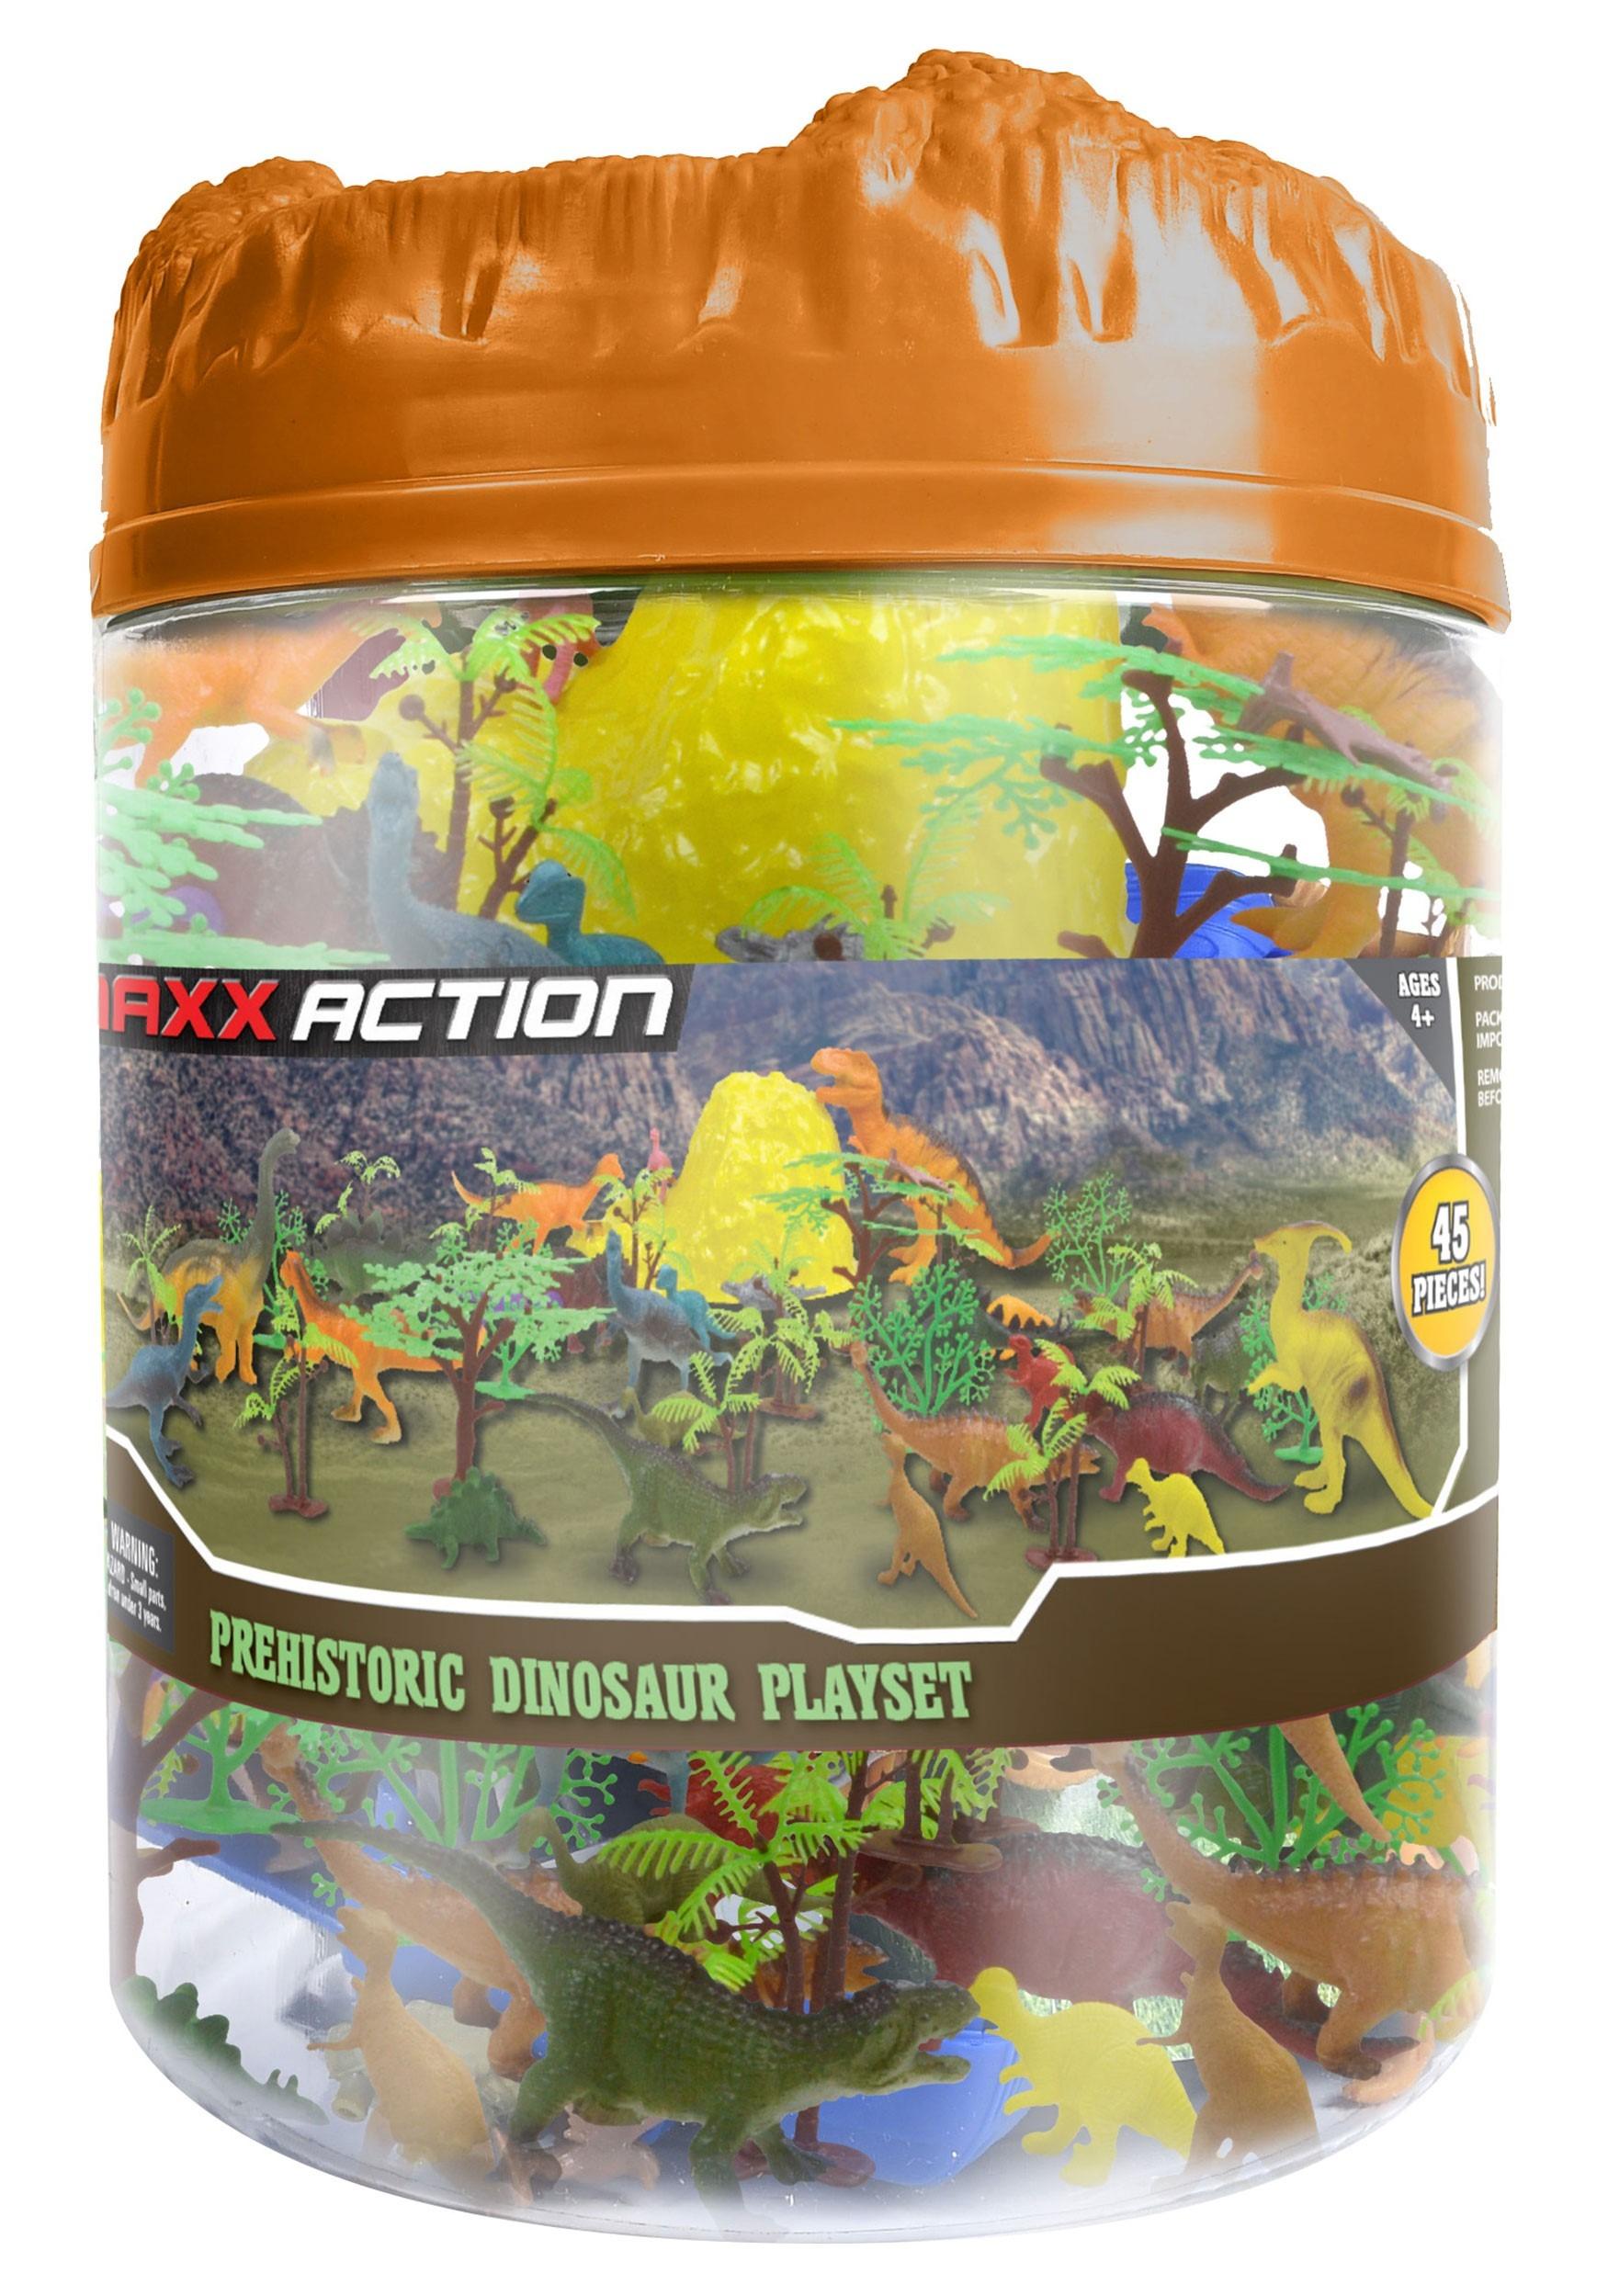 Prehistoric Dinosaur Playset Bucket